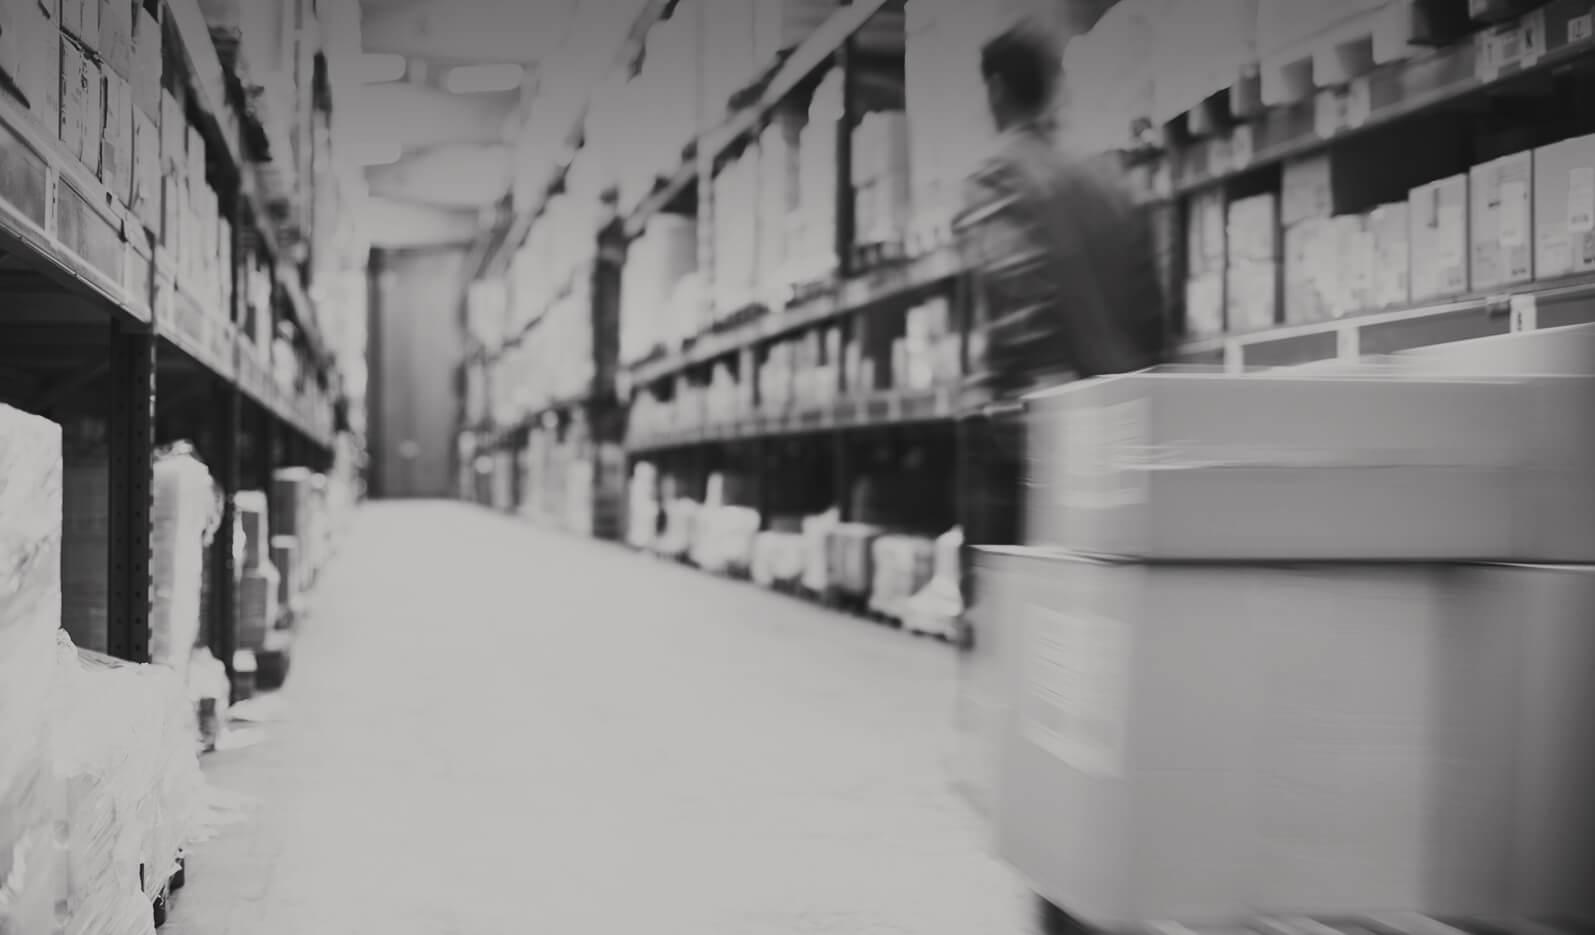 Warehouse essay